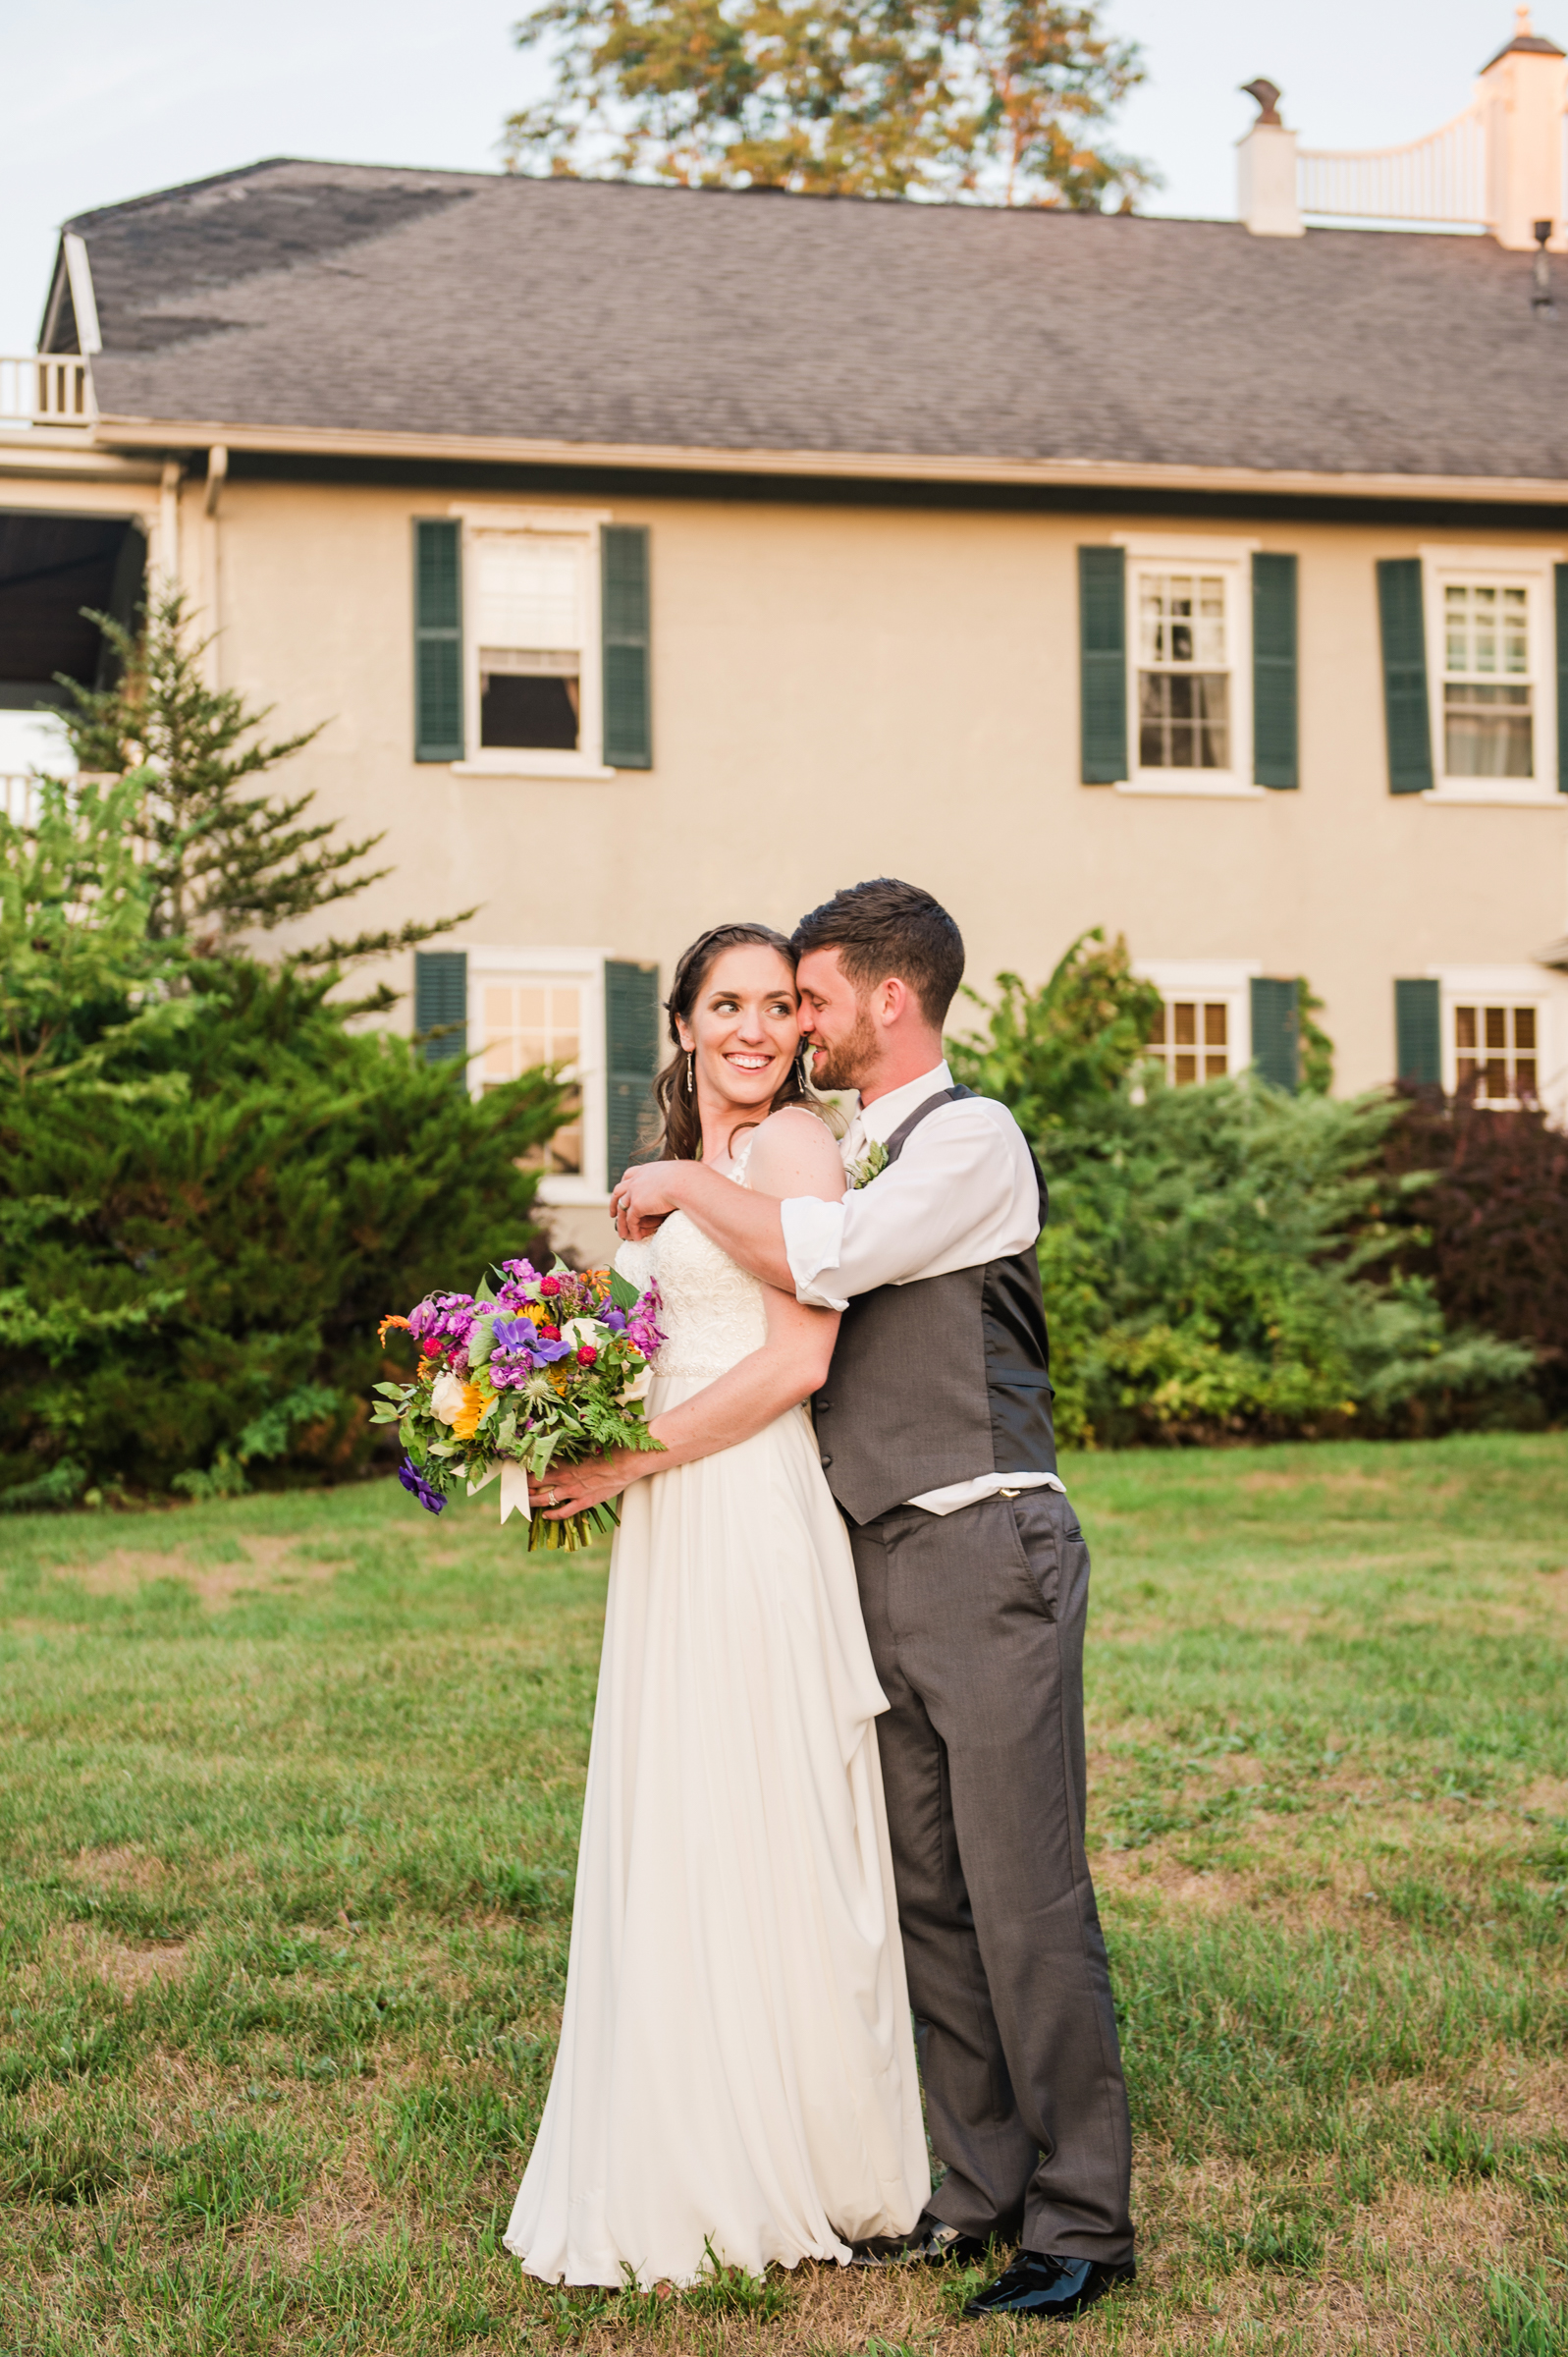 Jerris_Wadsworth_Wedding_Barn_Rochester_Wedding_JILL_STUDIO_Rochester_NY_Photographer_DSC_3089.jpg